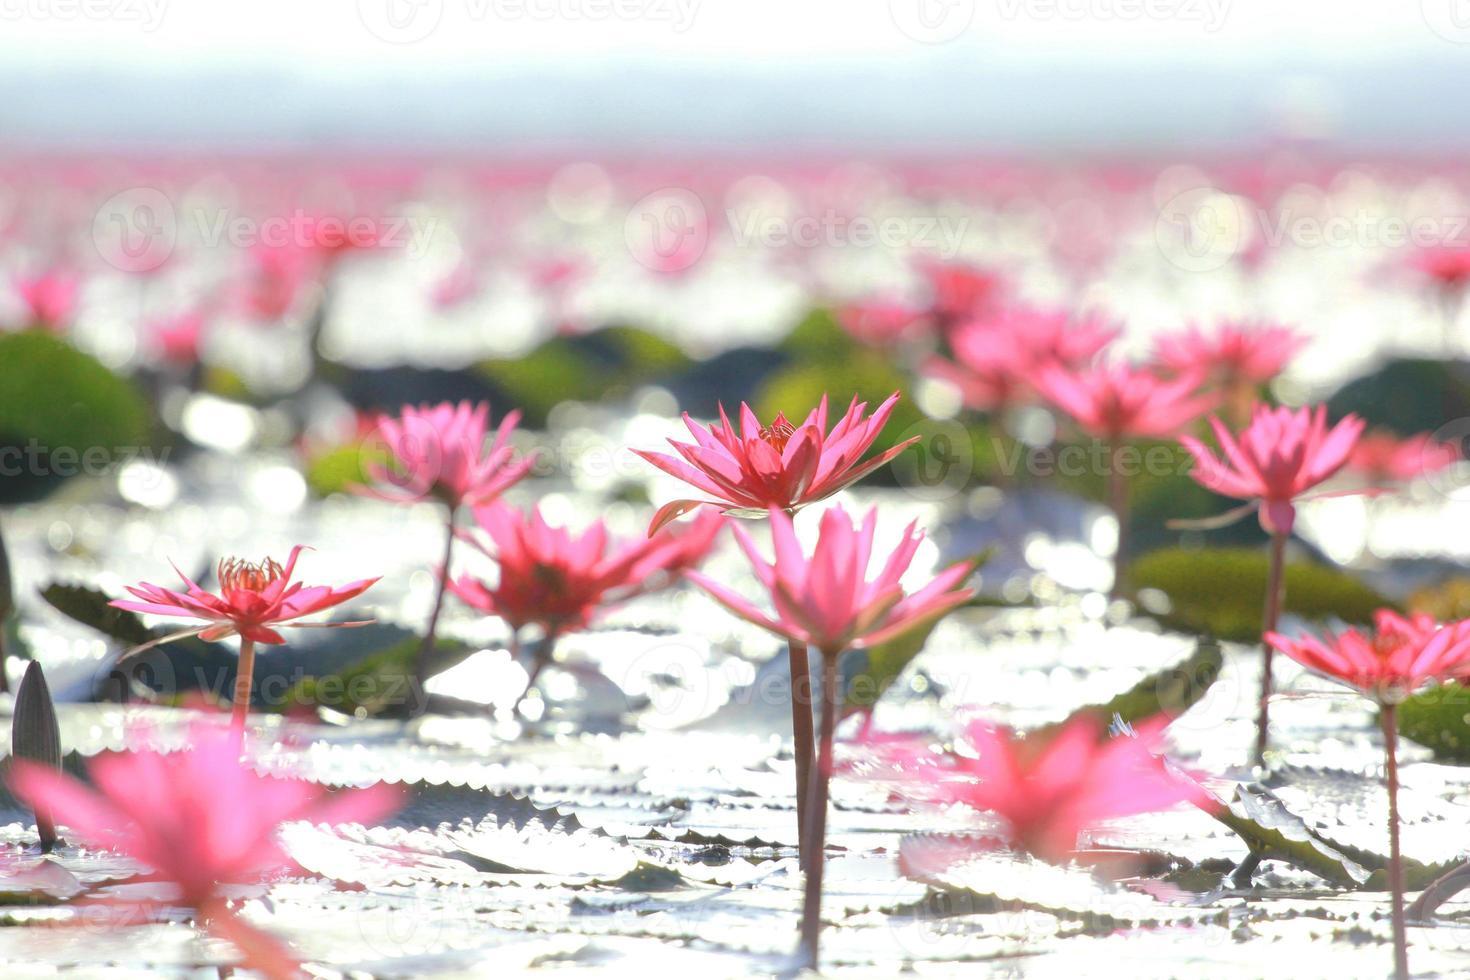 lila Lotusblume auf Wasser foto